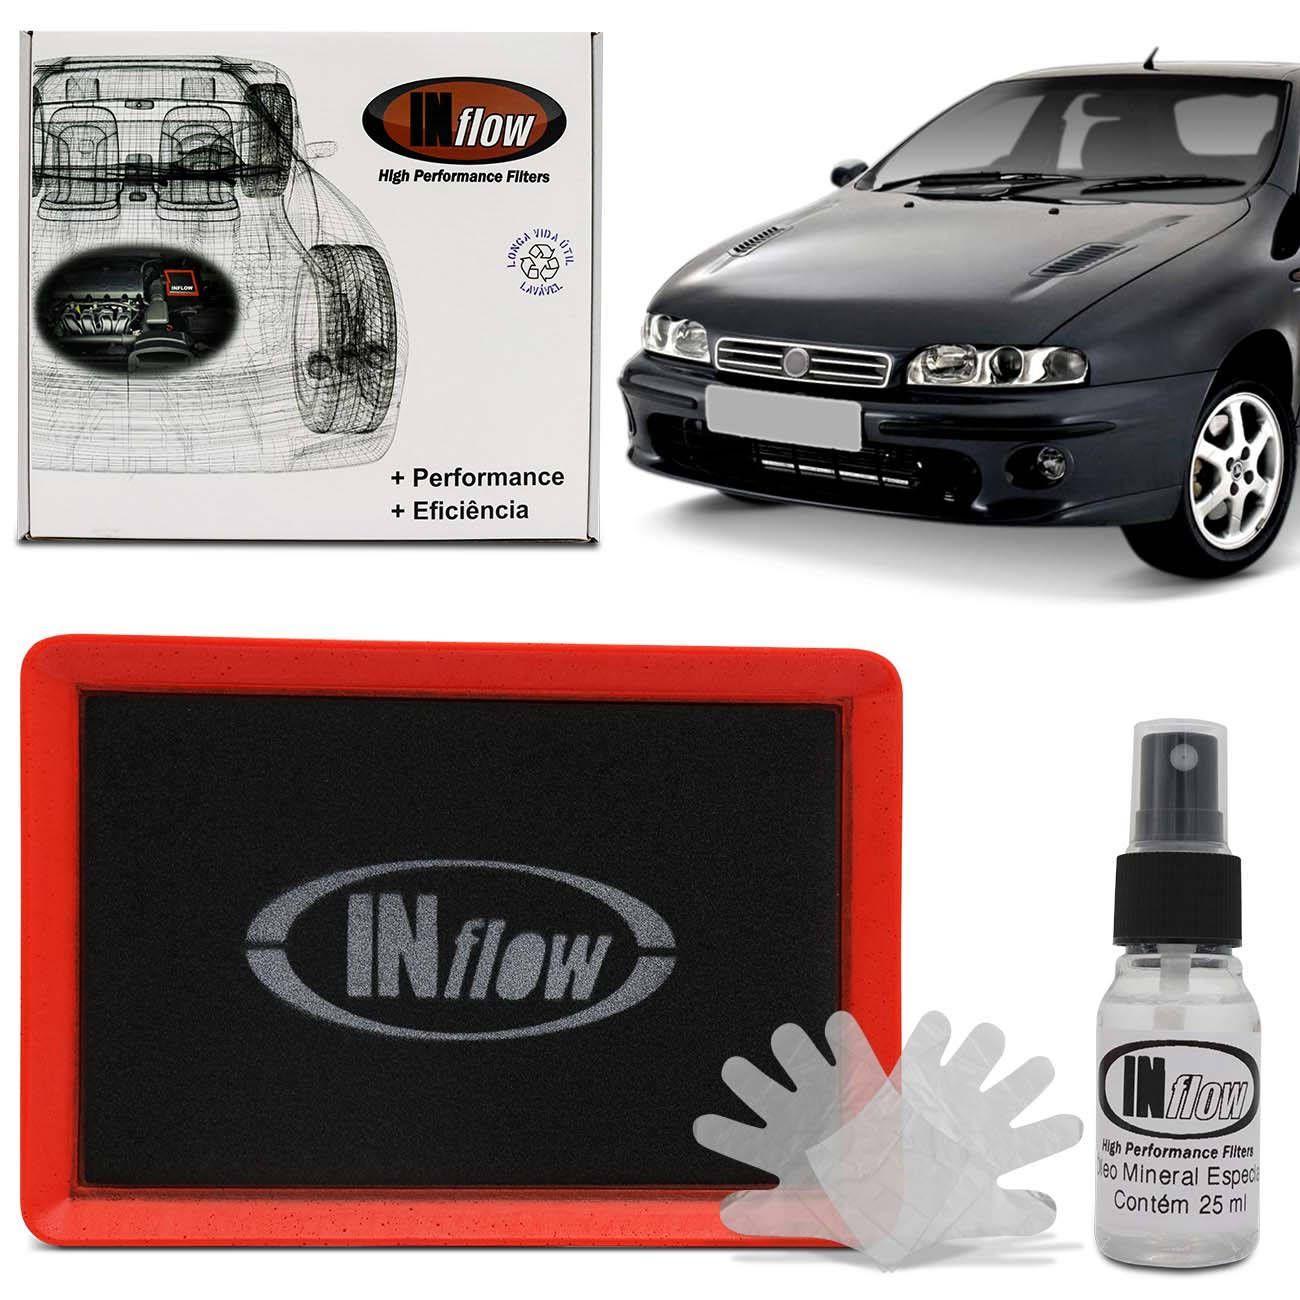 b8b5628d768 Filtro de Ar Esportivo Inflow Inbox Fiat Marea e Marea Weekend 99 a 08 Fiat  Brava HPF3150 R  163